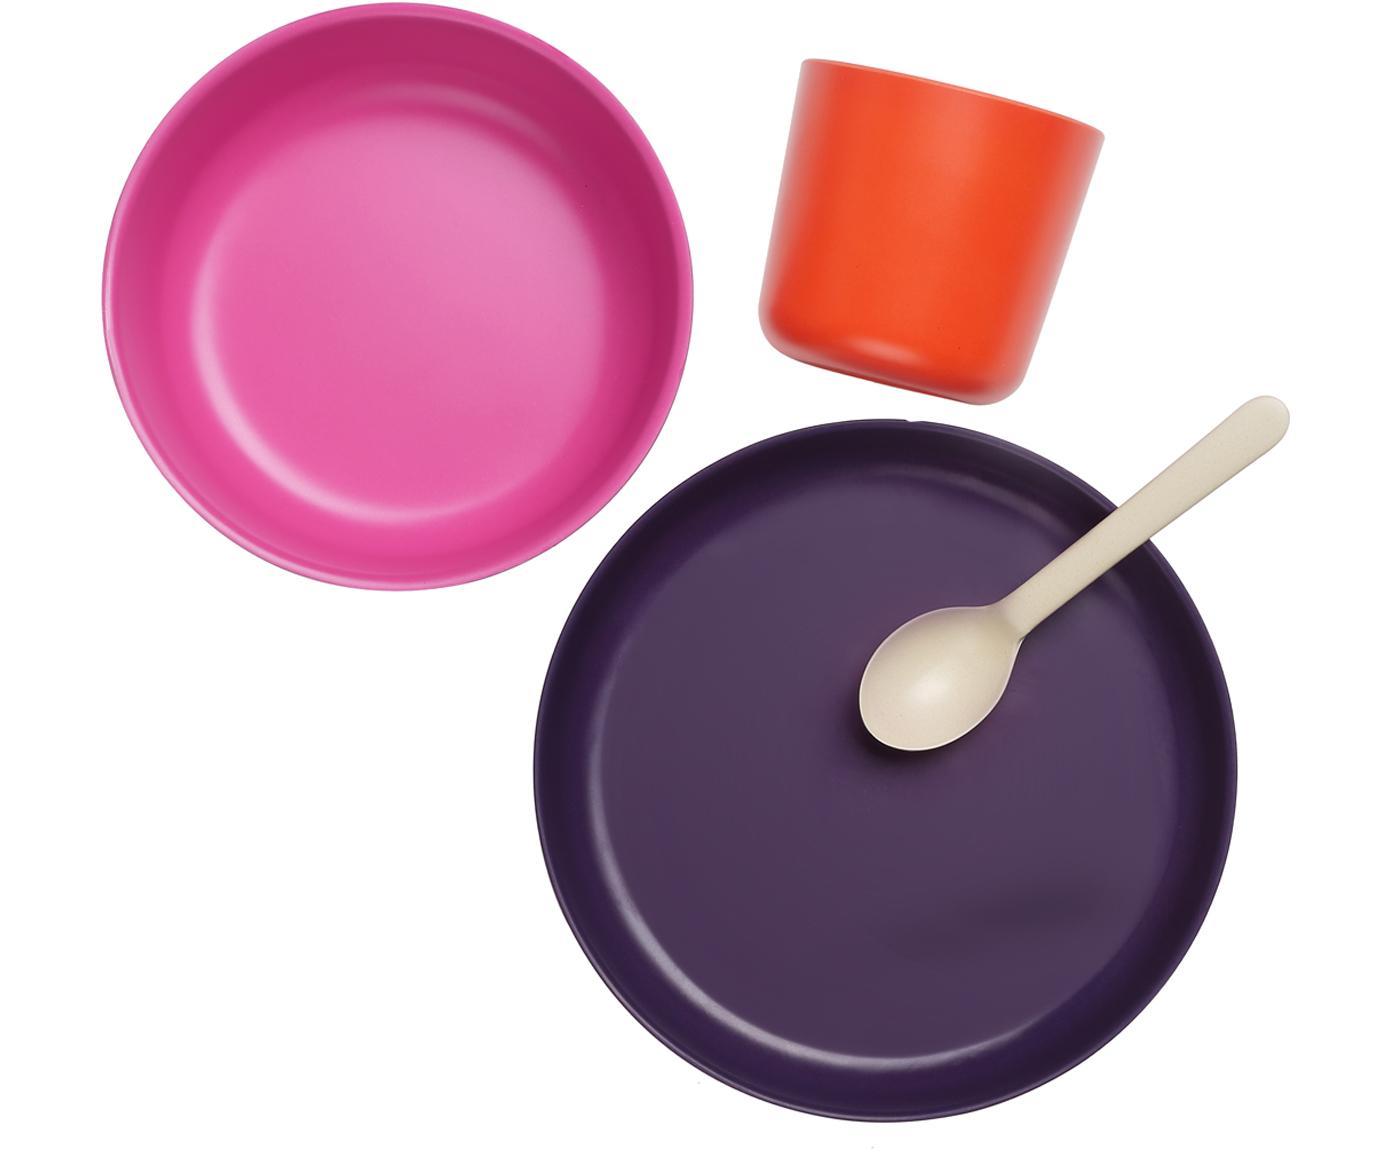 Frühstücksset Ume, 4-tlg., Bambusfasern, Melamin, lebensmittelecht BPA, PVC und Phthalate frei, Violett, Rosa, Rot, Cremeweiss, Verschiedene Grössen